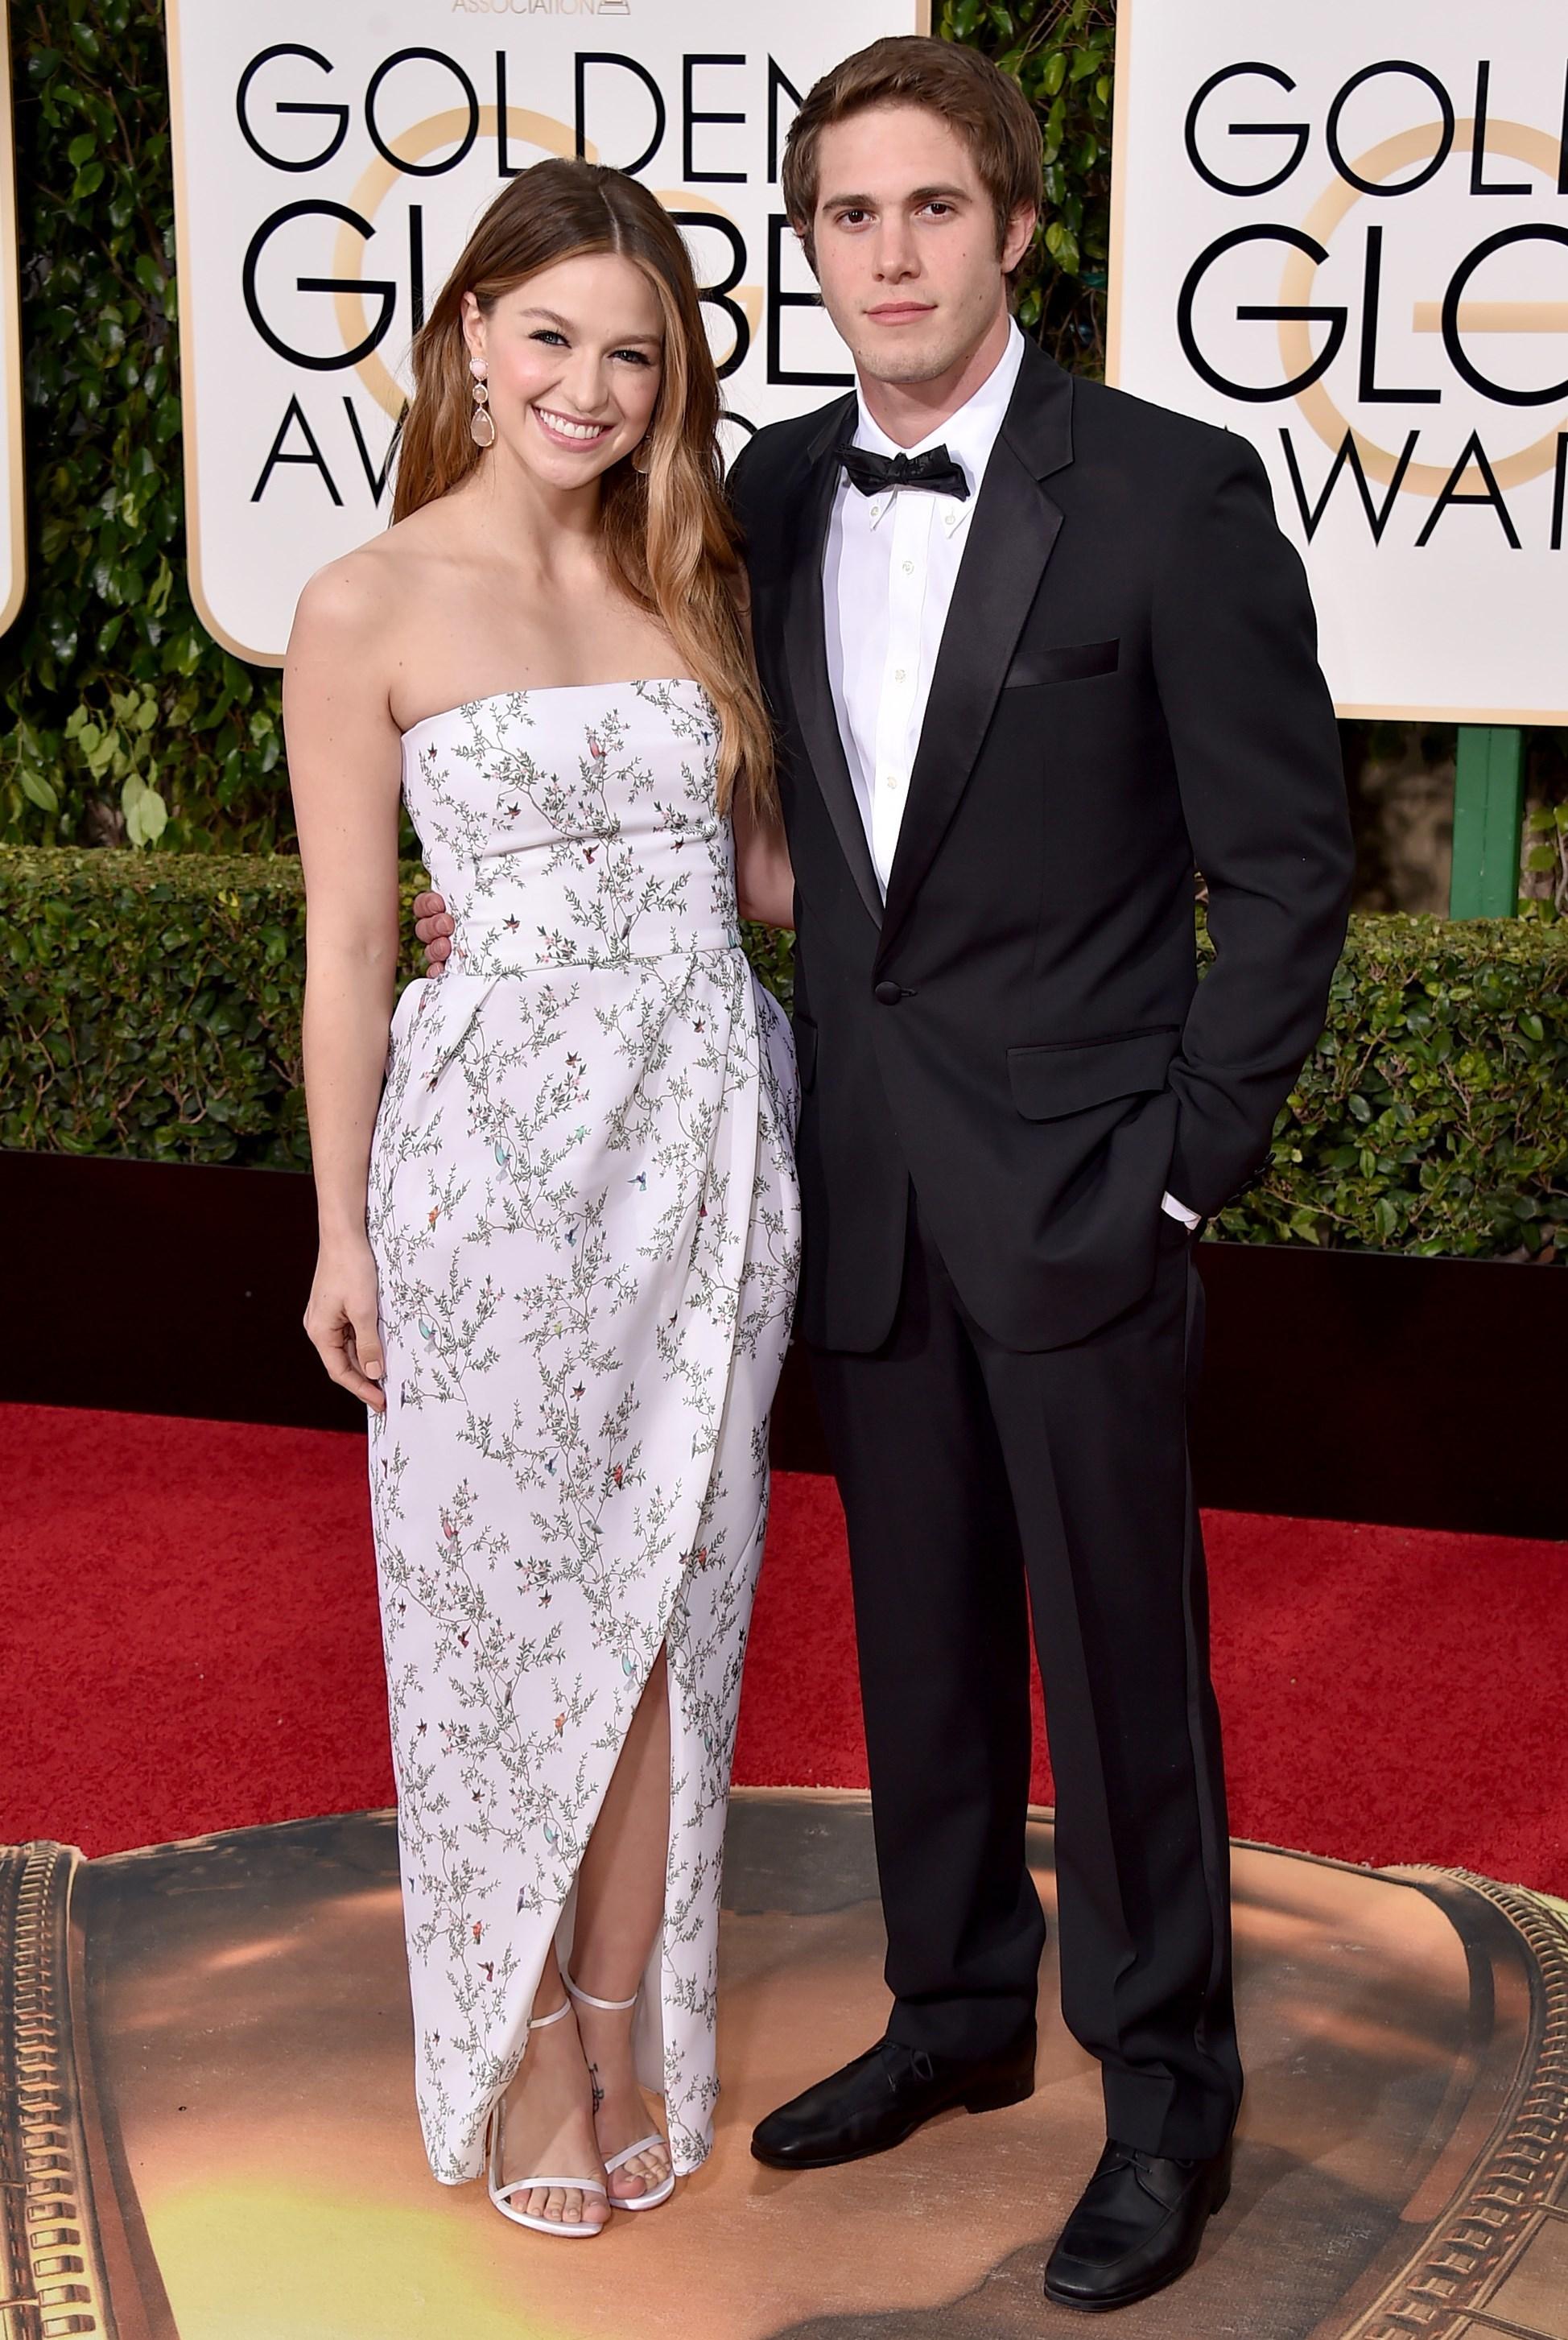 Supergirl S Melissa Benoist And Blake Jenner Are Divorced Wonderwall Com